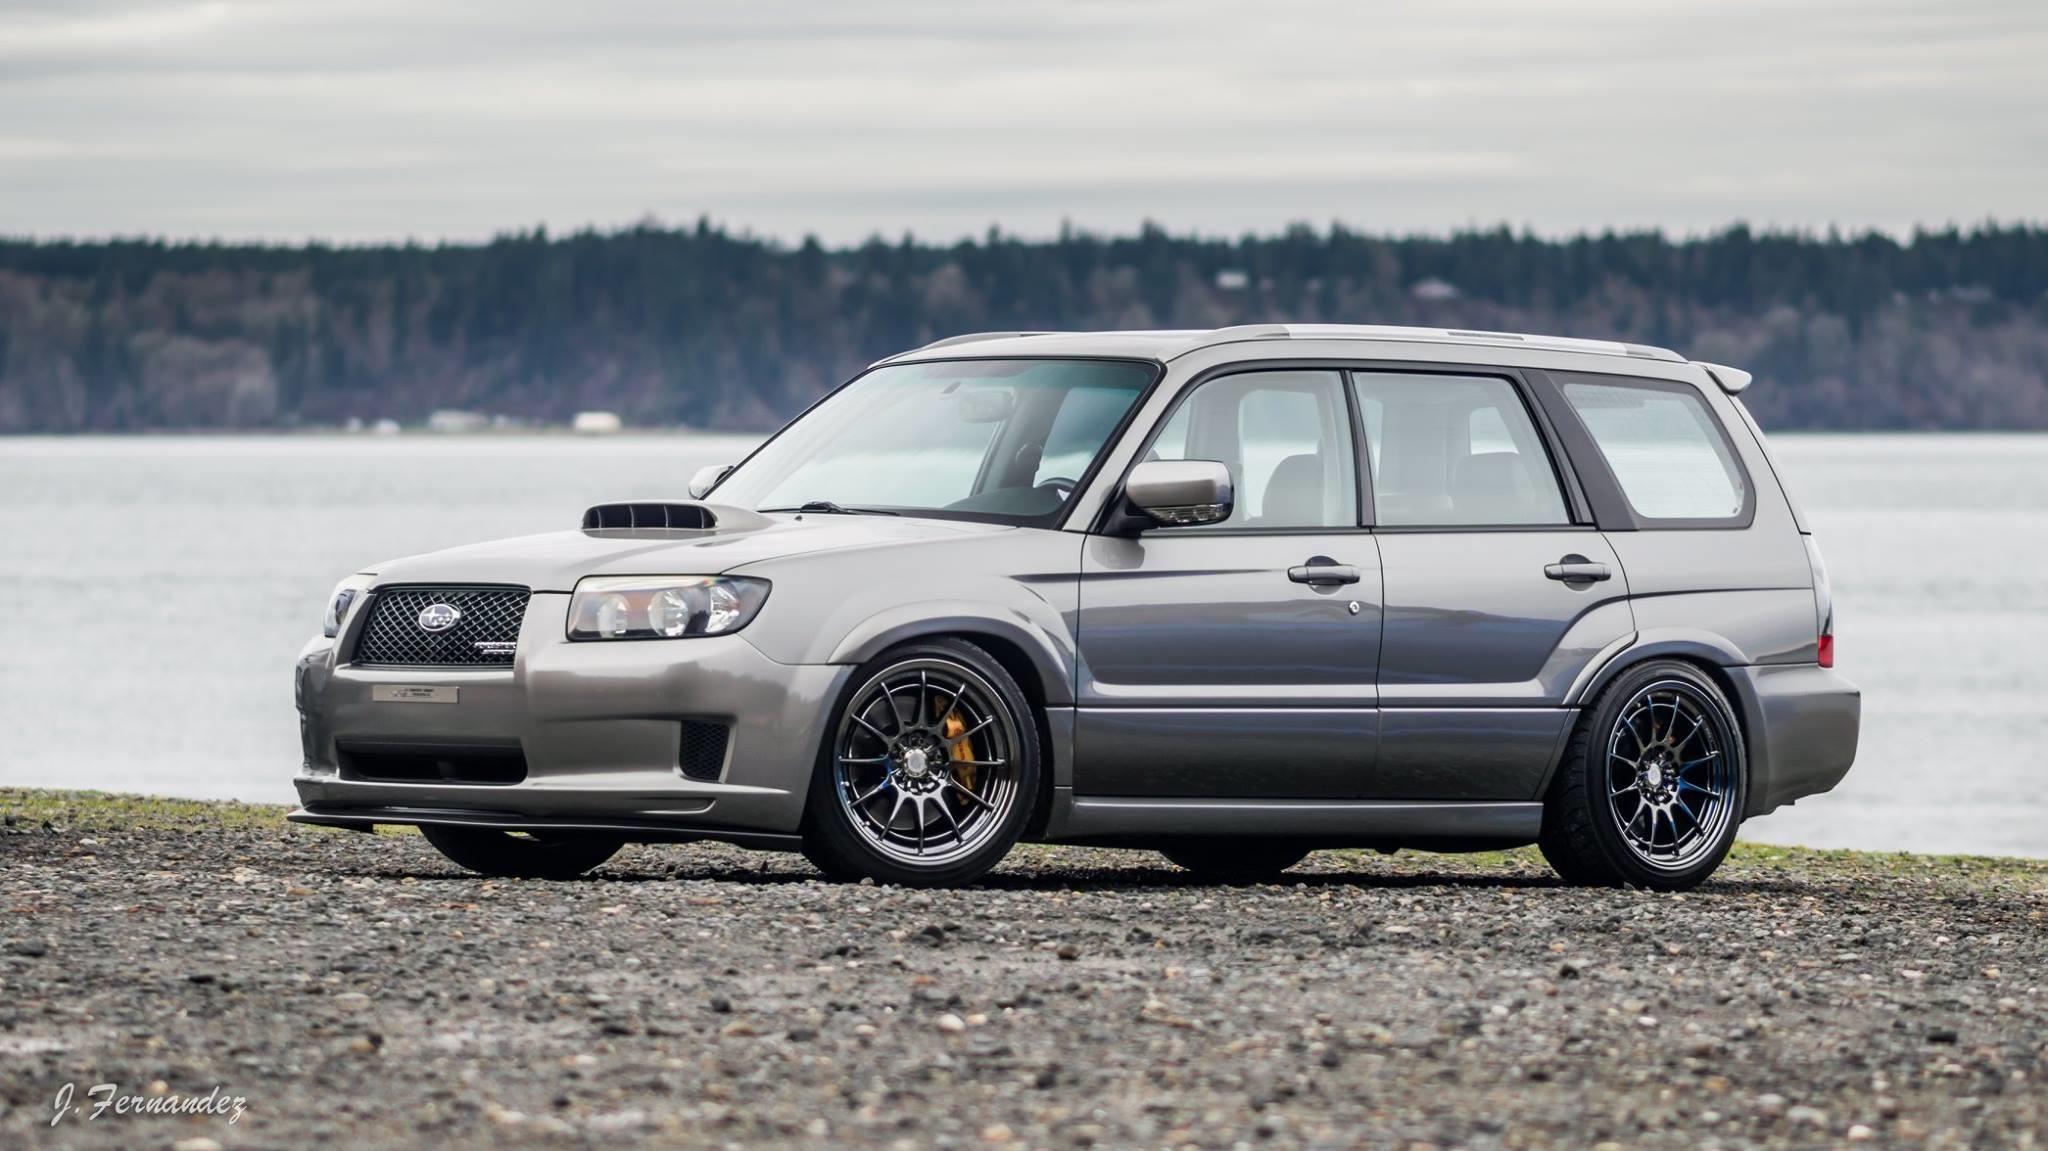 Subaru After Modification And Or Restoration By Cobb Tuning Chariotz Subaru Forester Xt Subaru Forester Subaru Wagon